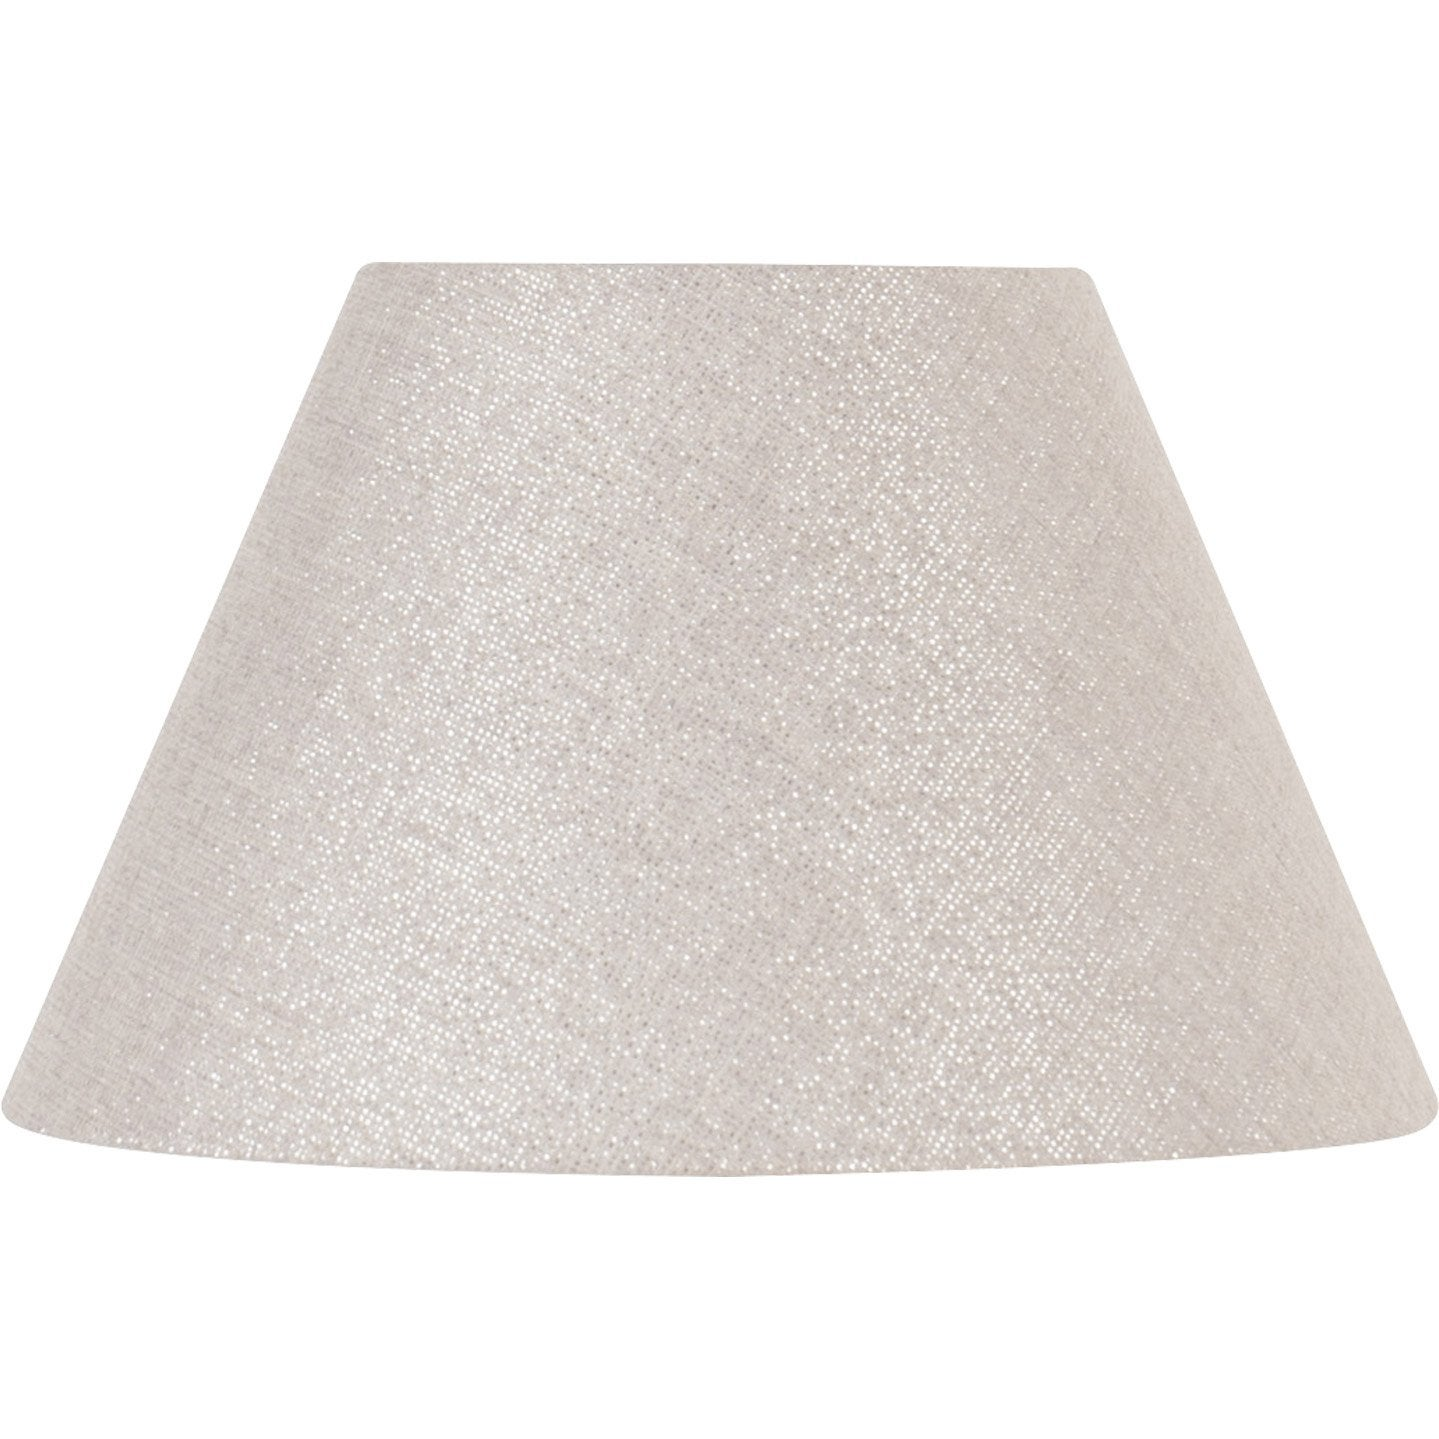 abat jour sweet 30 cm coton shine leroy merlin. Black Bedroom Furniture Sets. Home Design Ideas